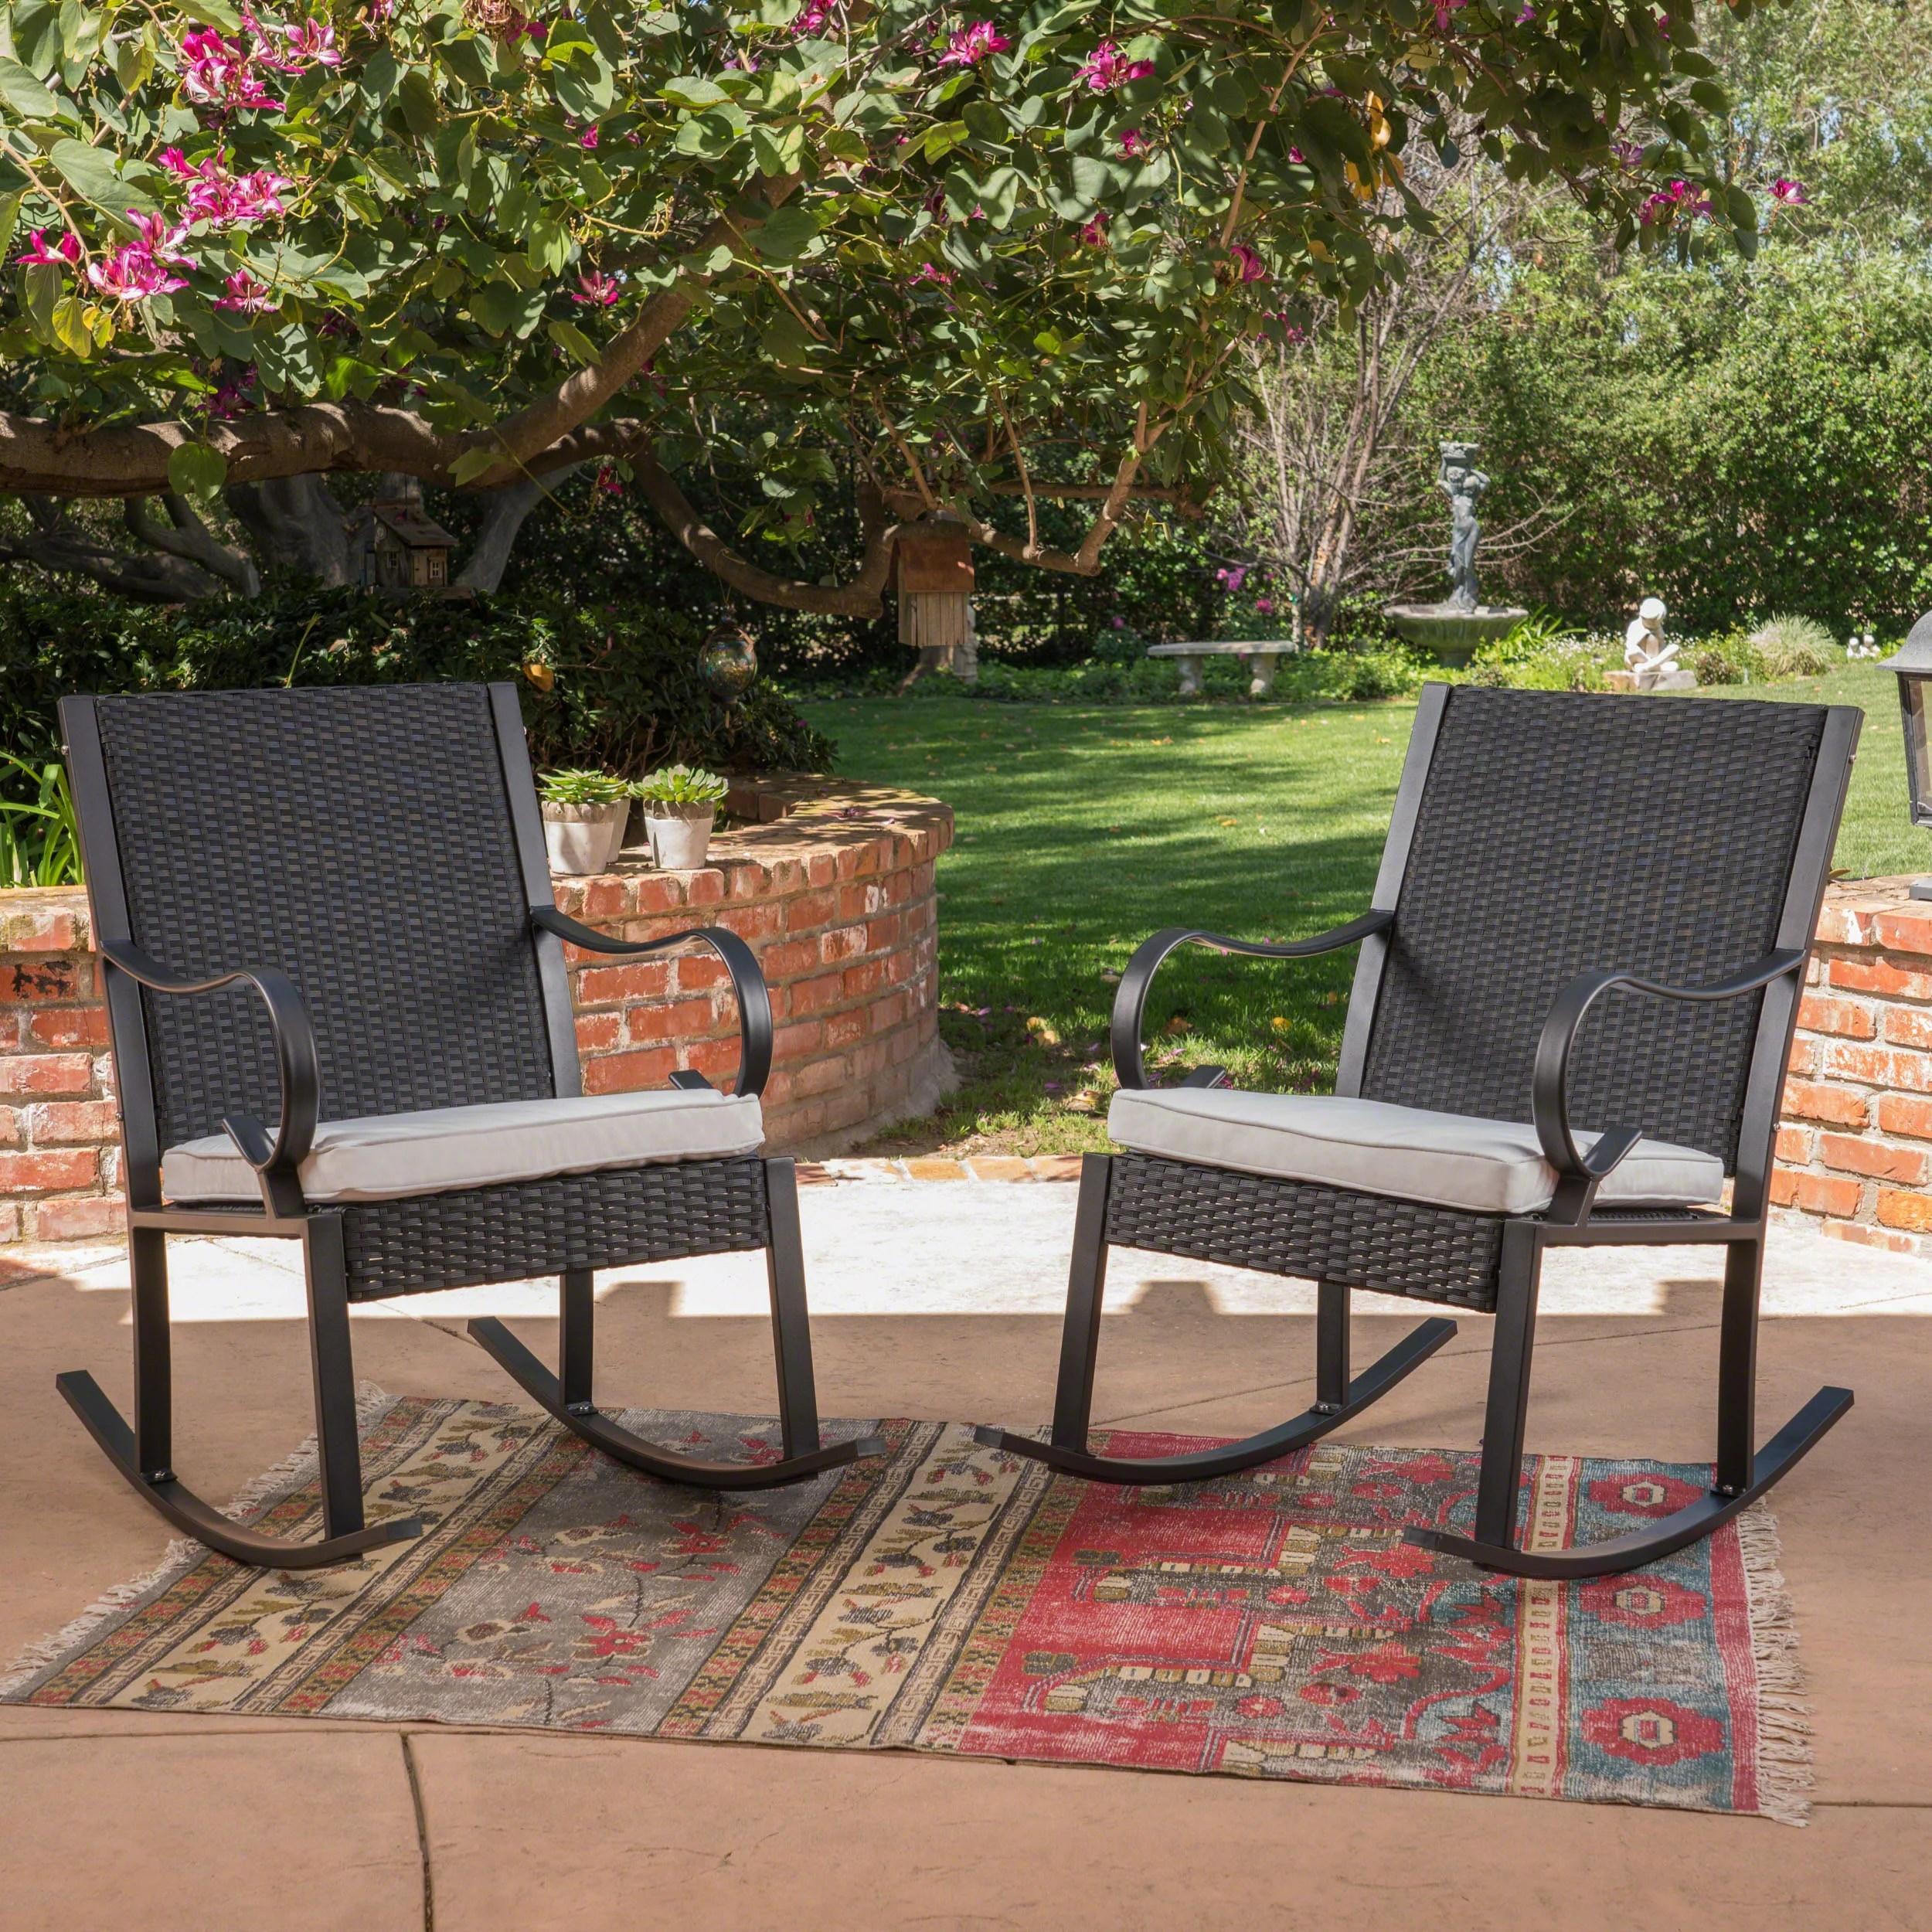 Horizon Outdoor Wicker Rocking Chair With Cushion White Black Walmart Com Walmart Com